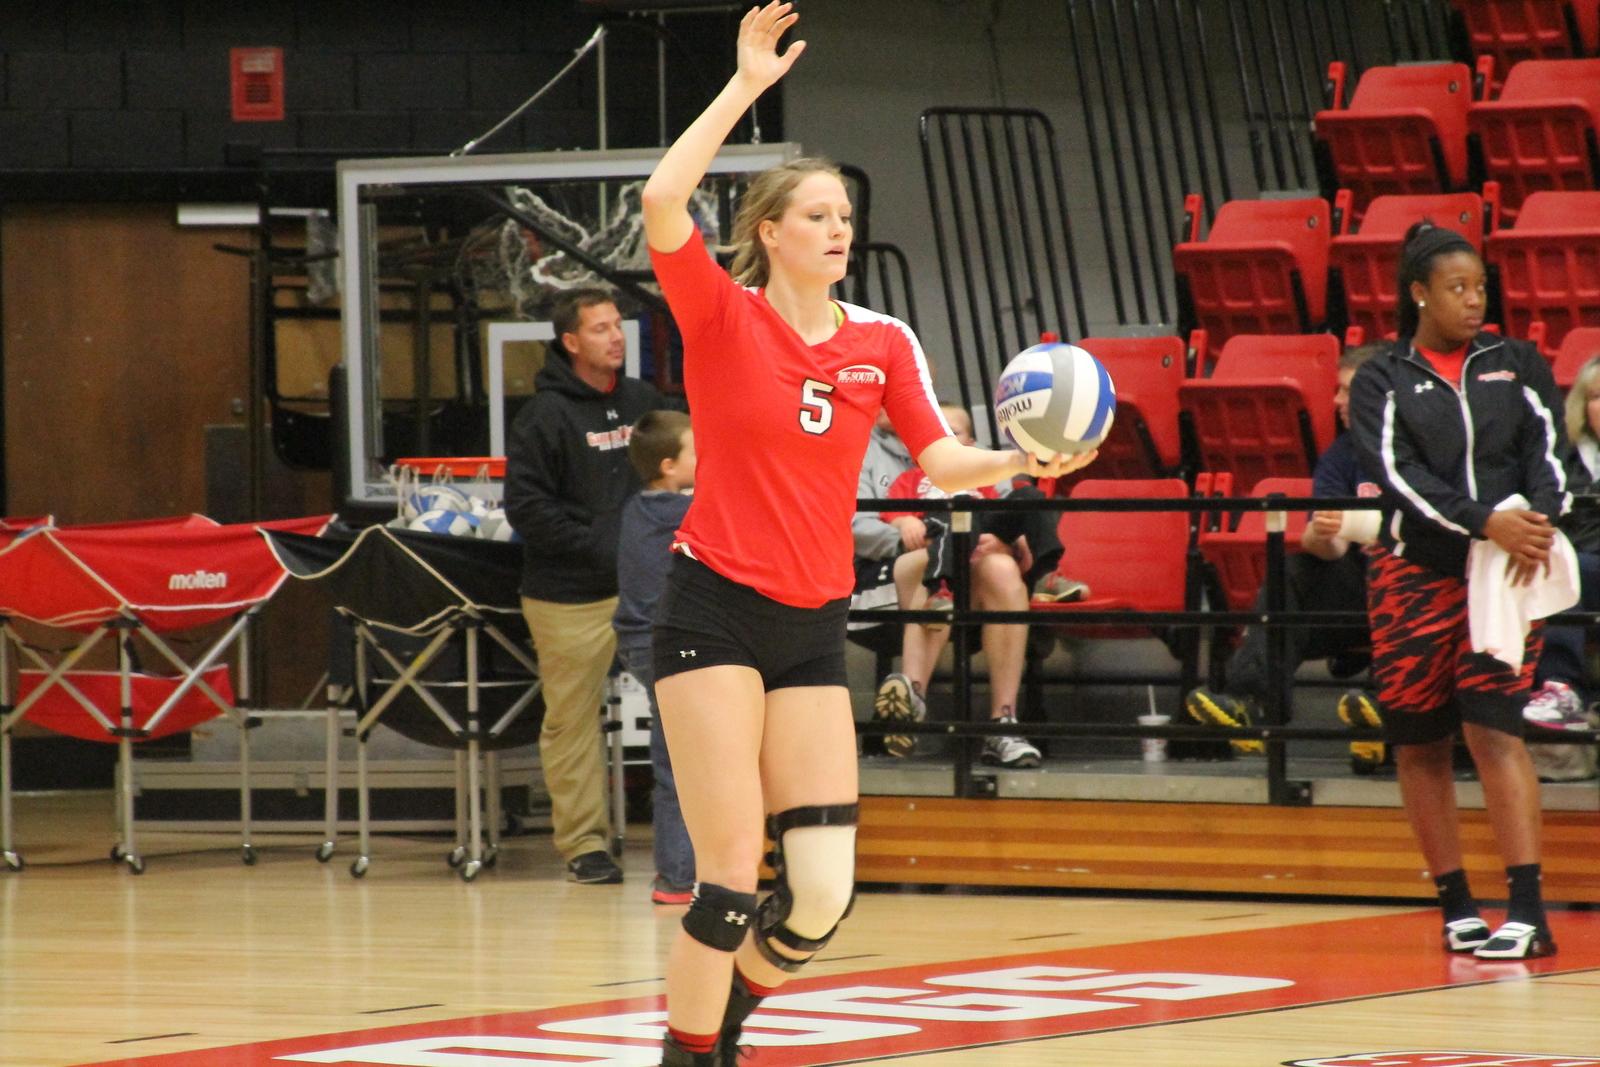 5, Sydney Marshall serves the ball.